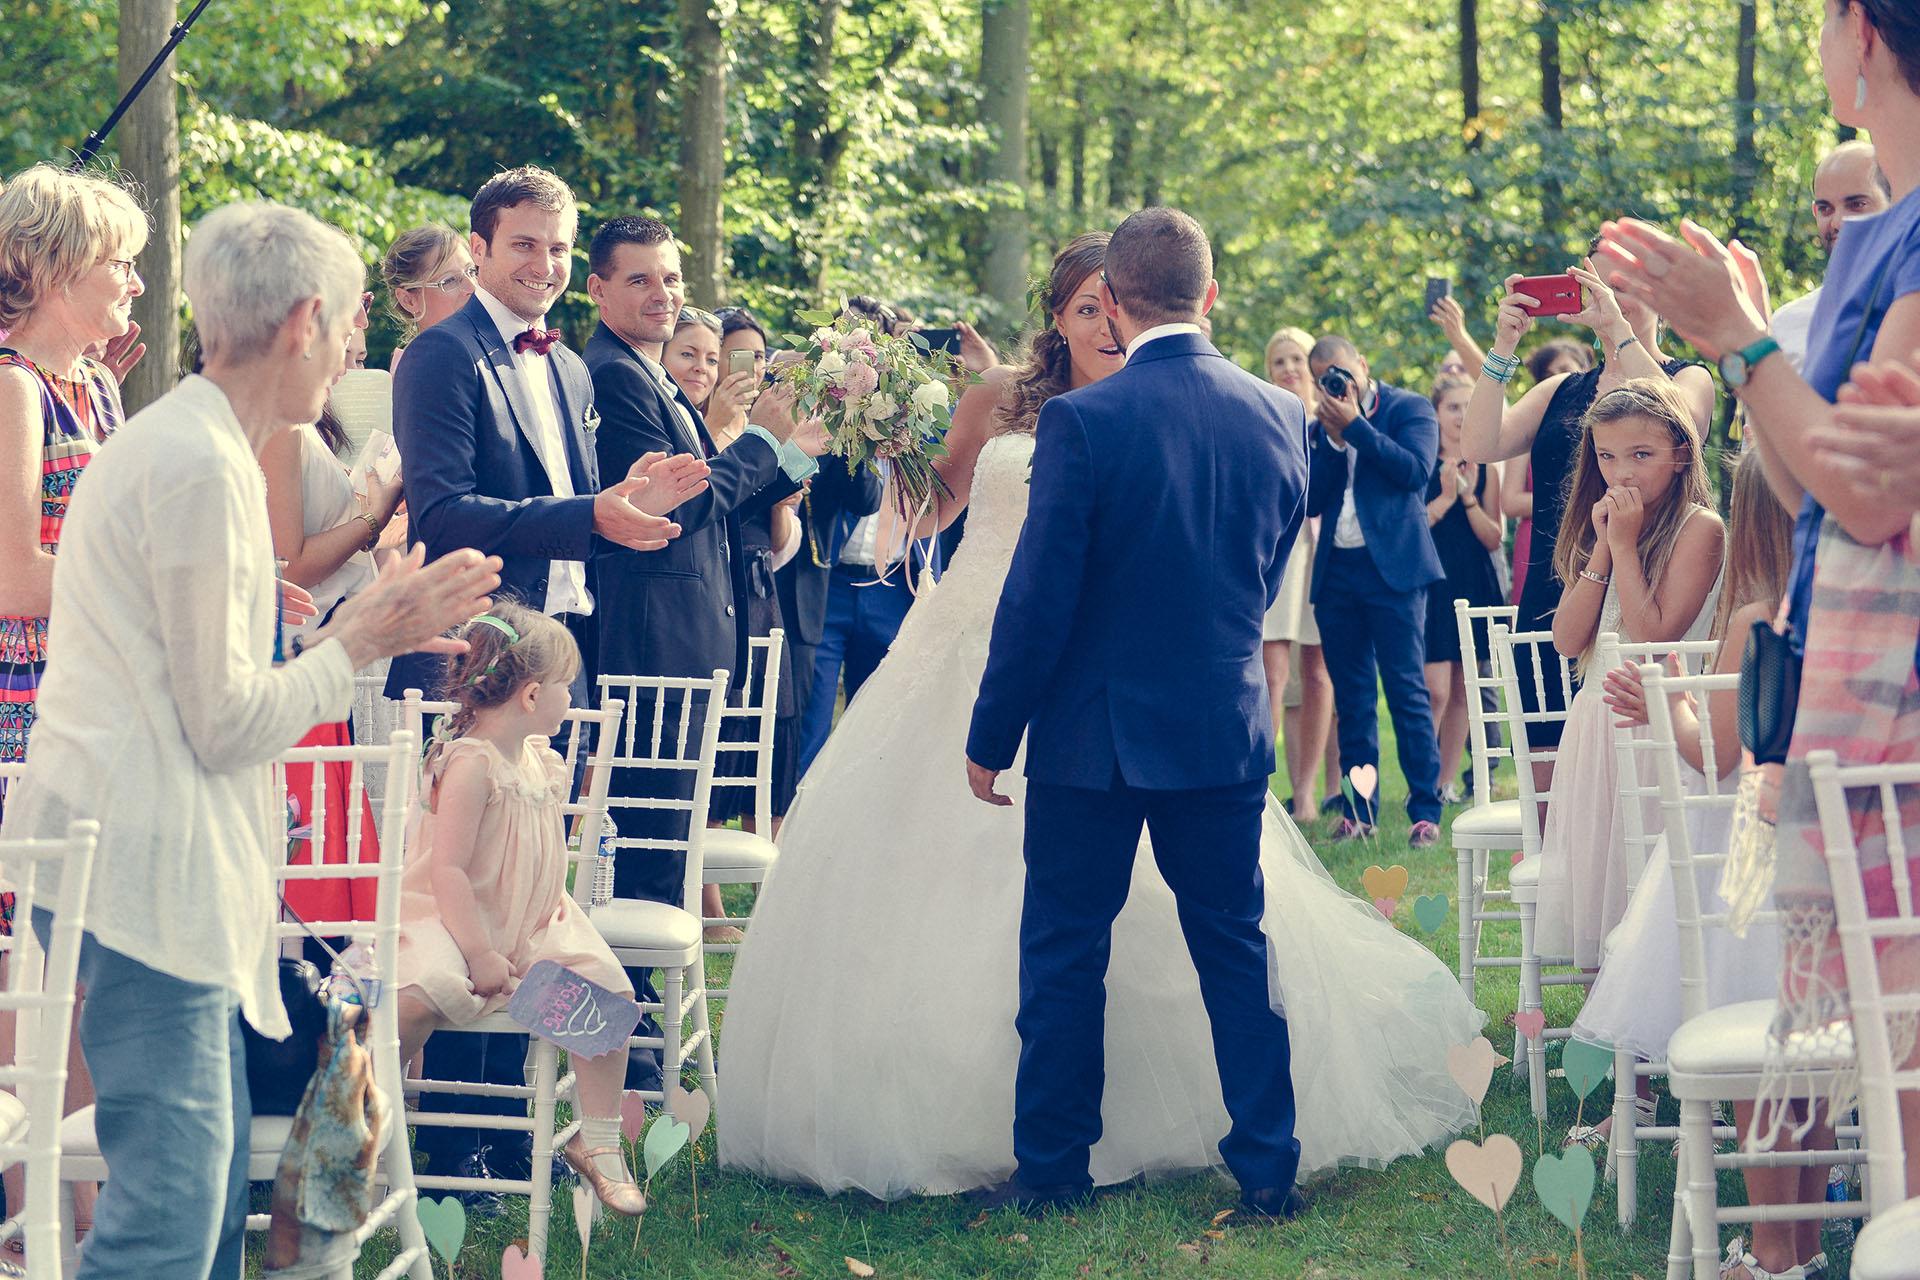 maya-angelsen-photographe-mariage-ile-de-france-essonne